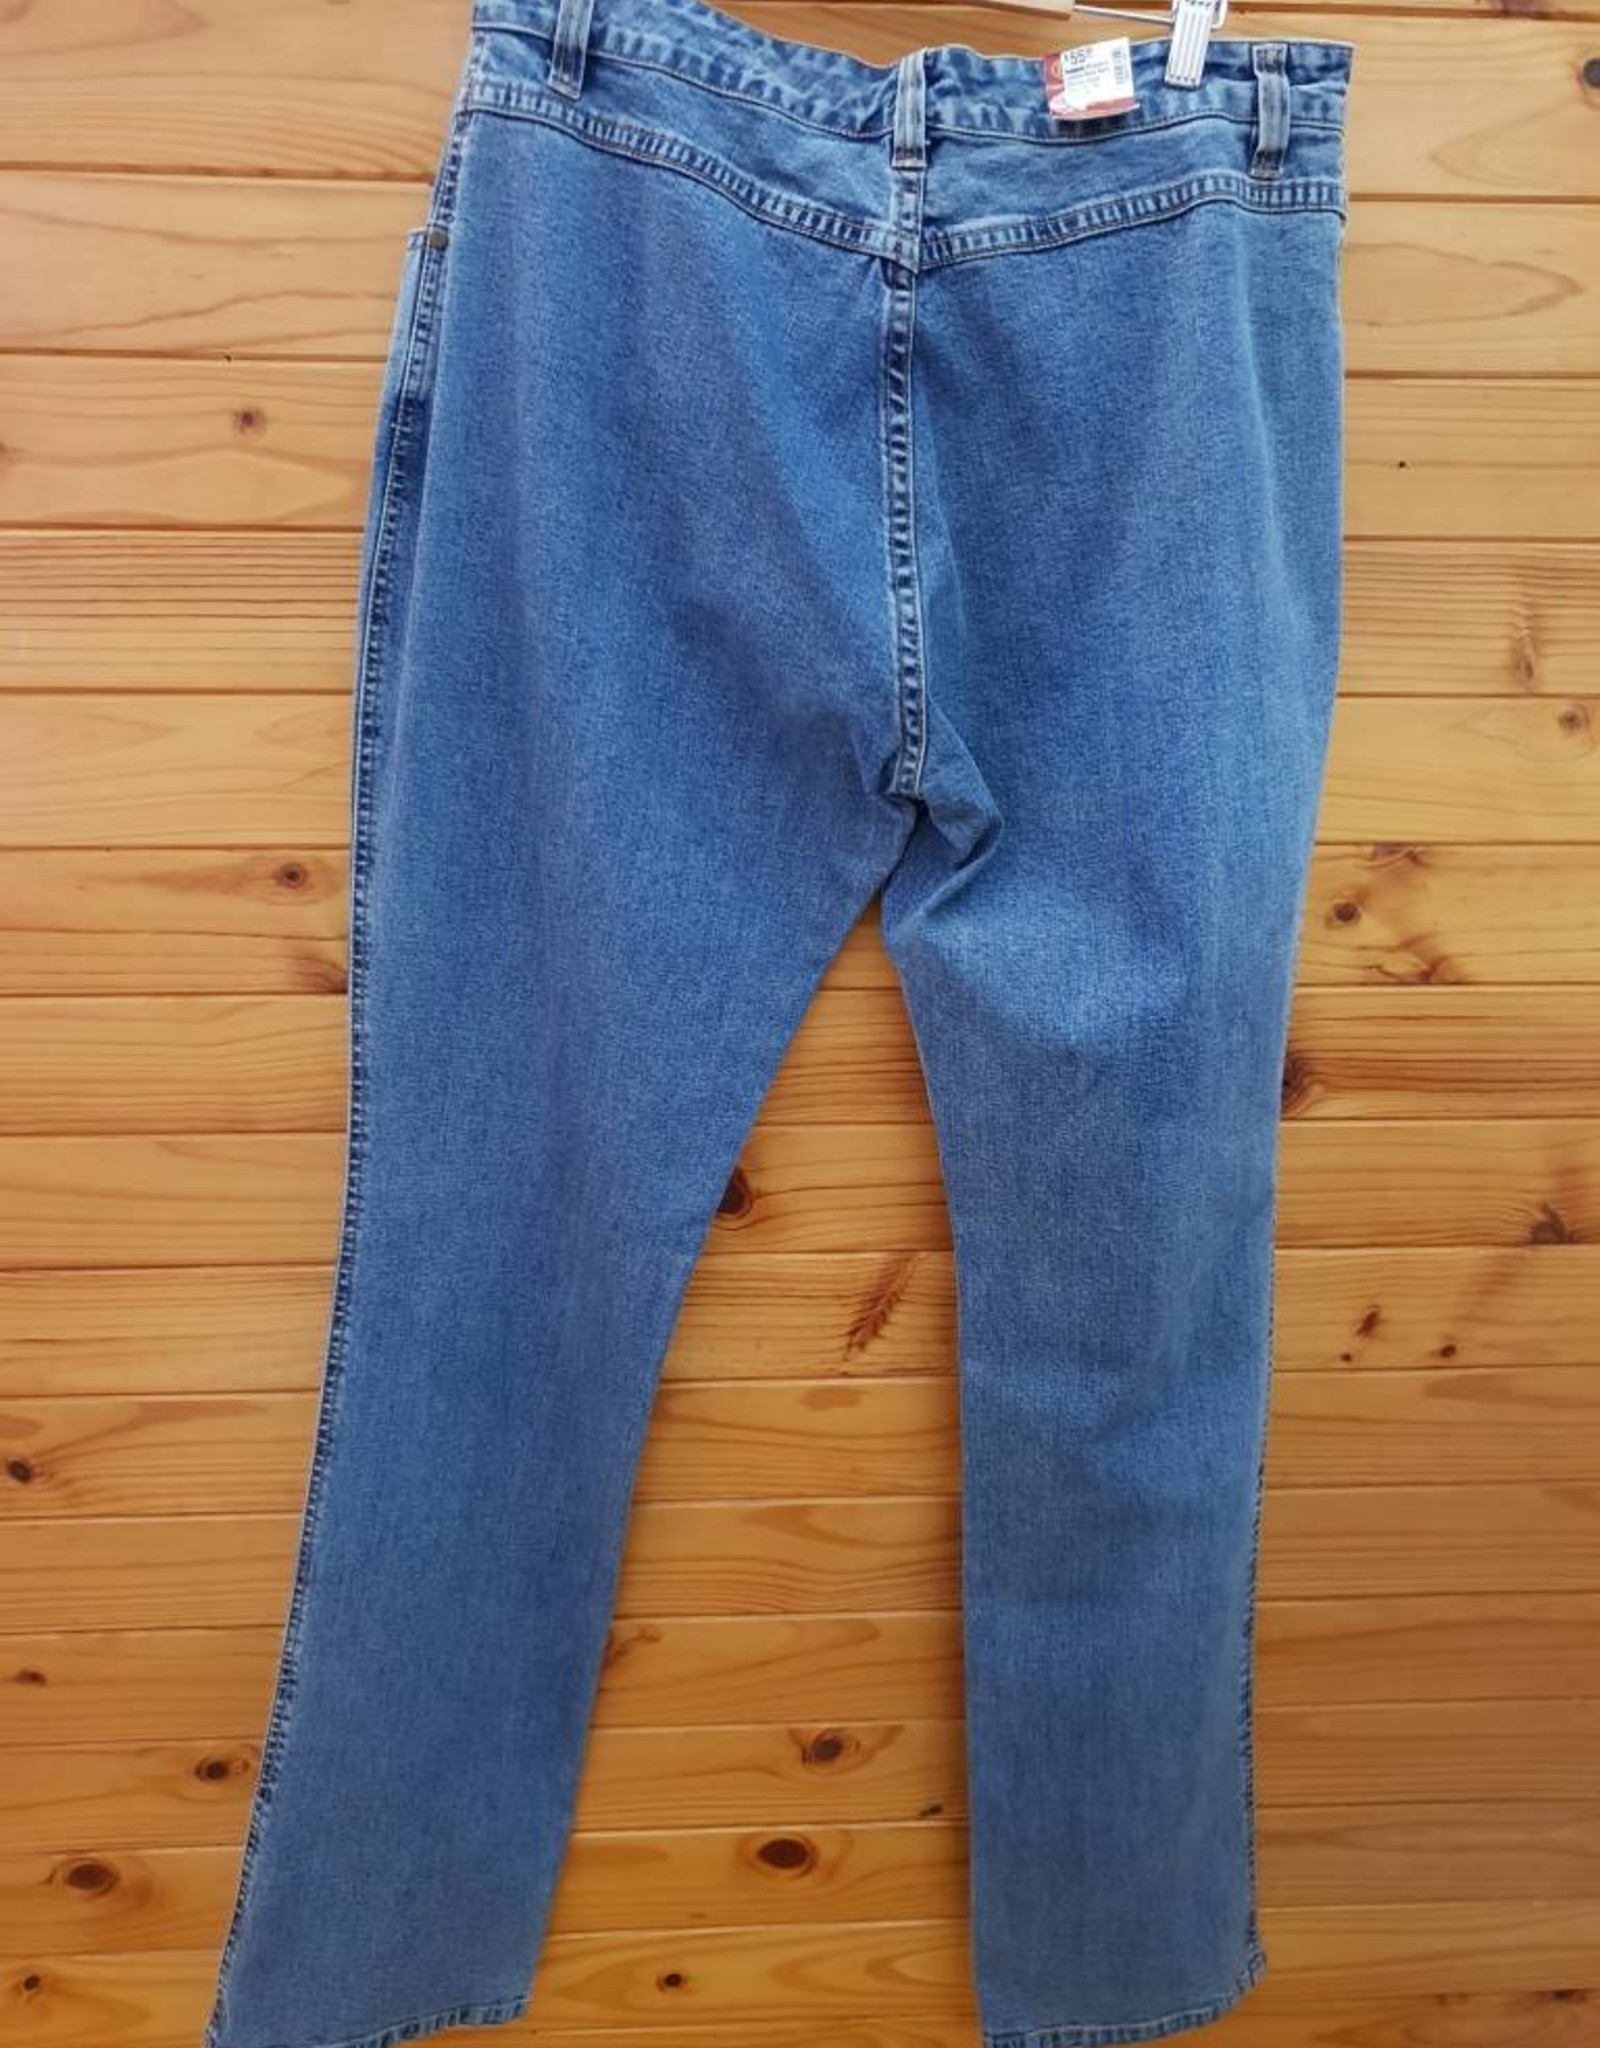 Brigalow Bare Back Denim Jean Ladies - Size 10x34